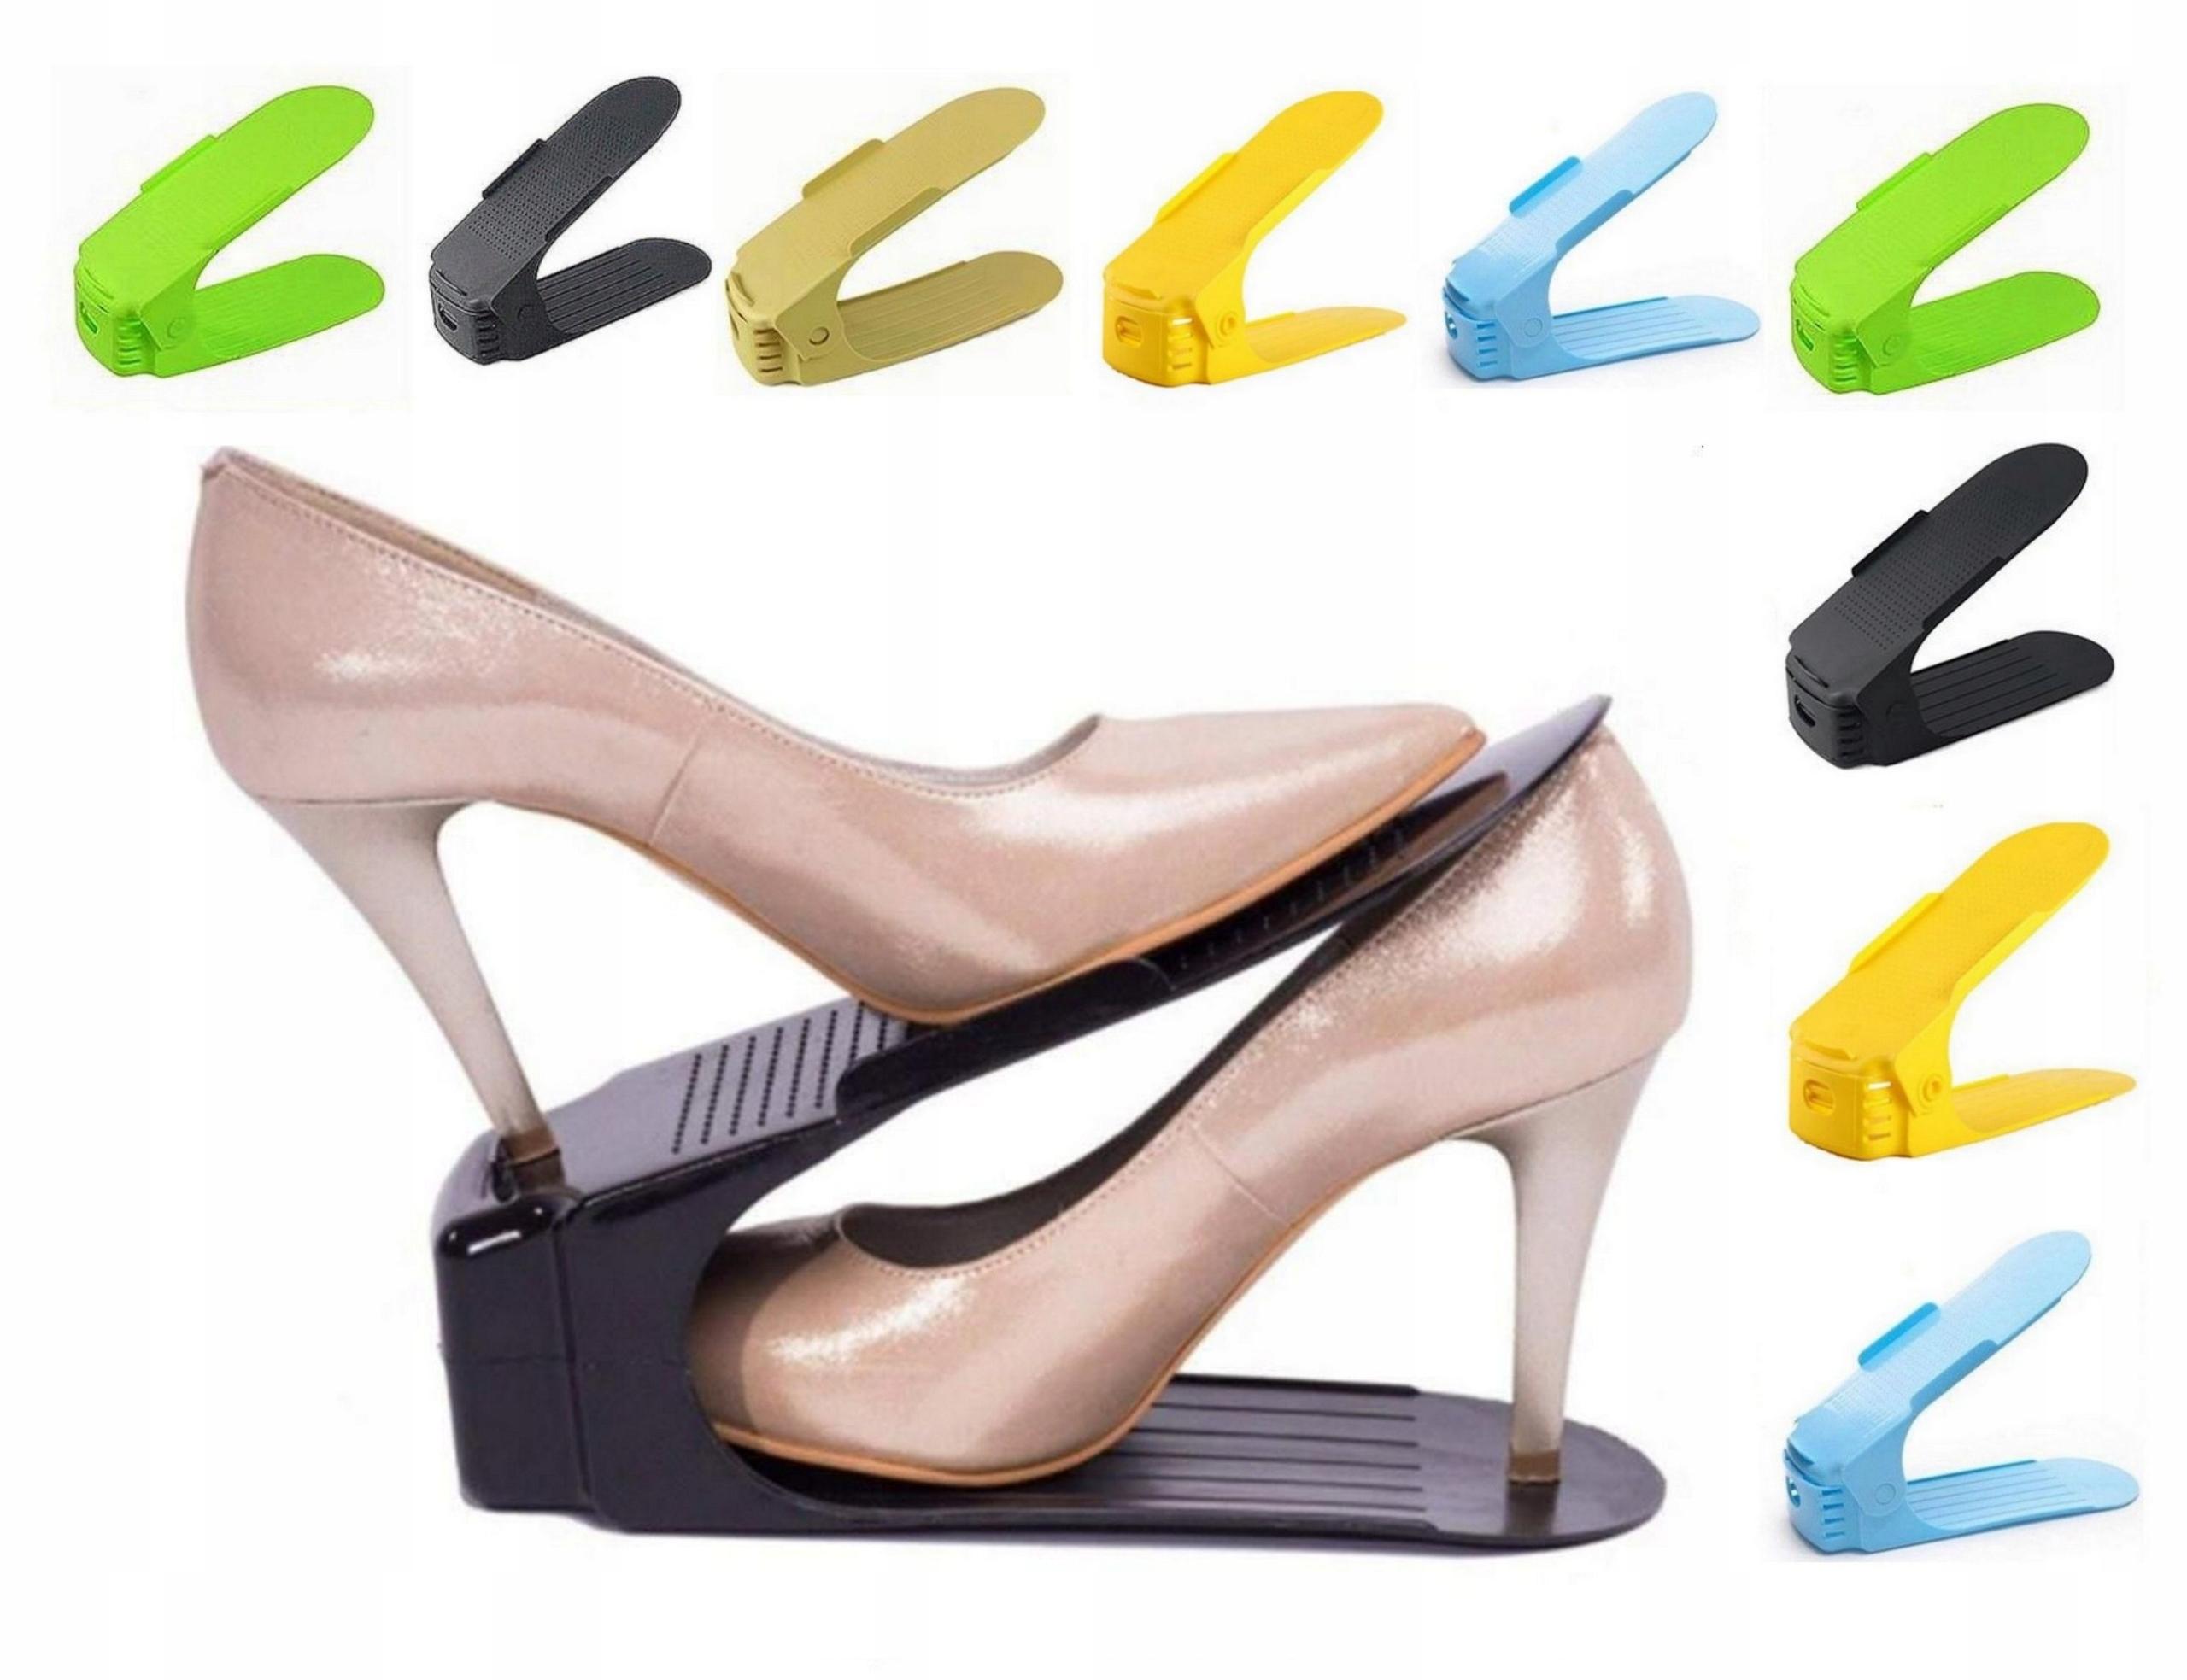 SHOE ORGANIZER Подставка для обуви STAND 10 шт.